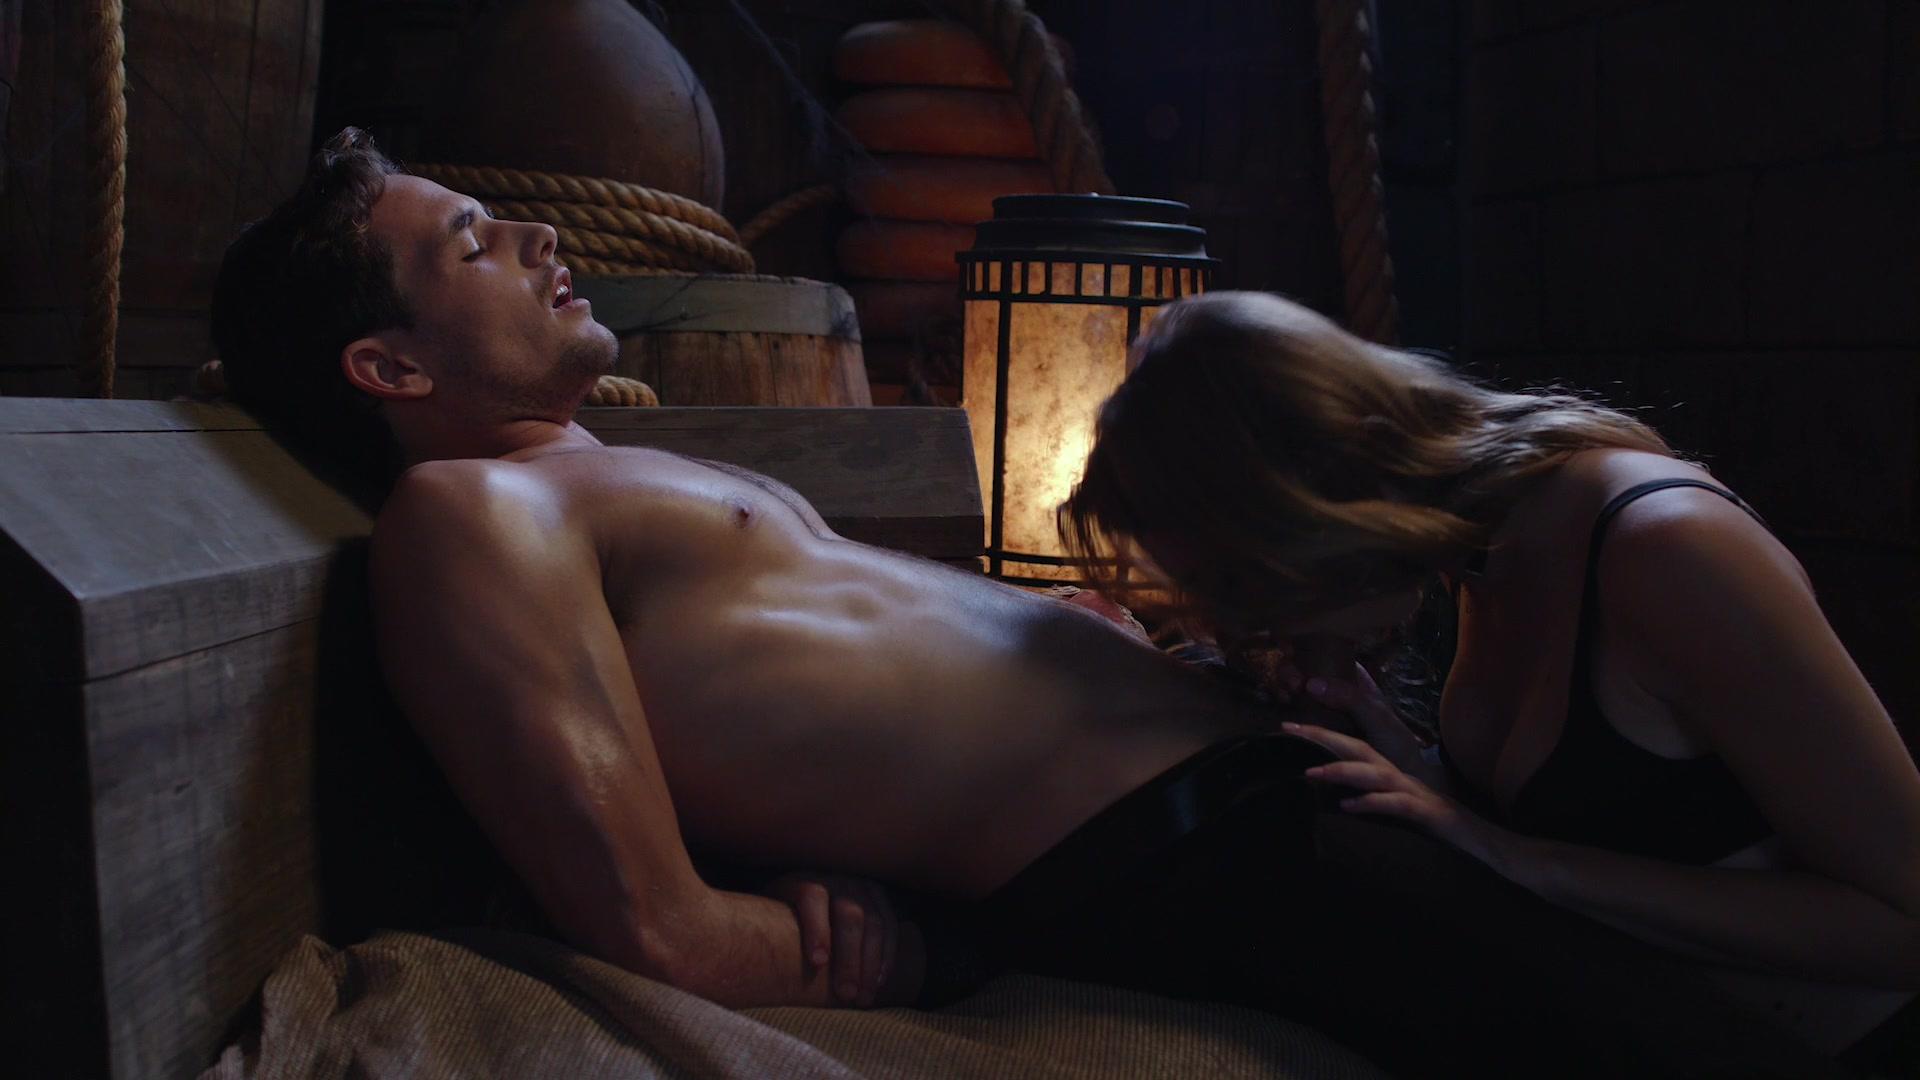 eroticheskie-momenti-iz-kinofilmov-onlayn